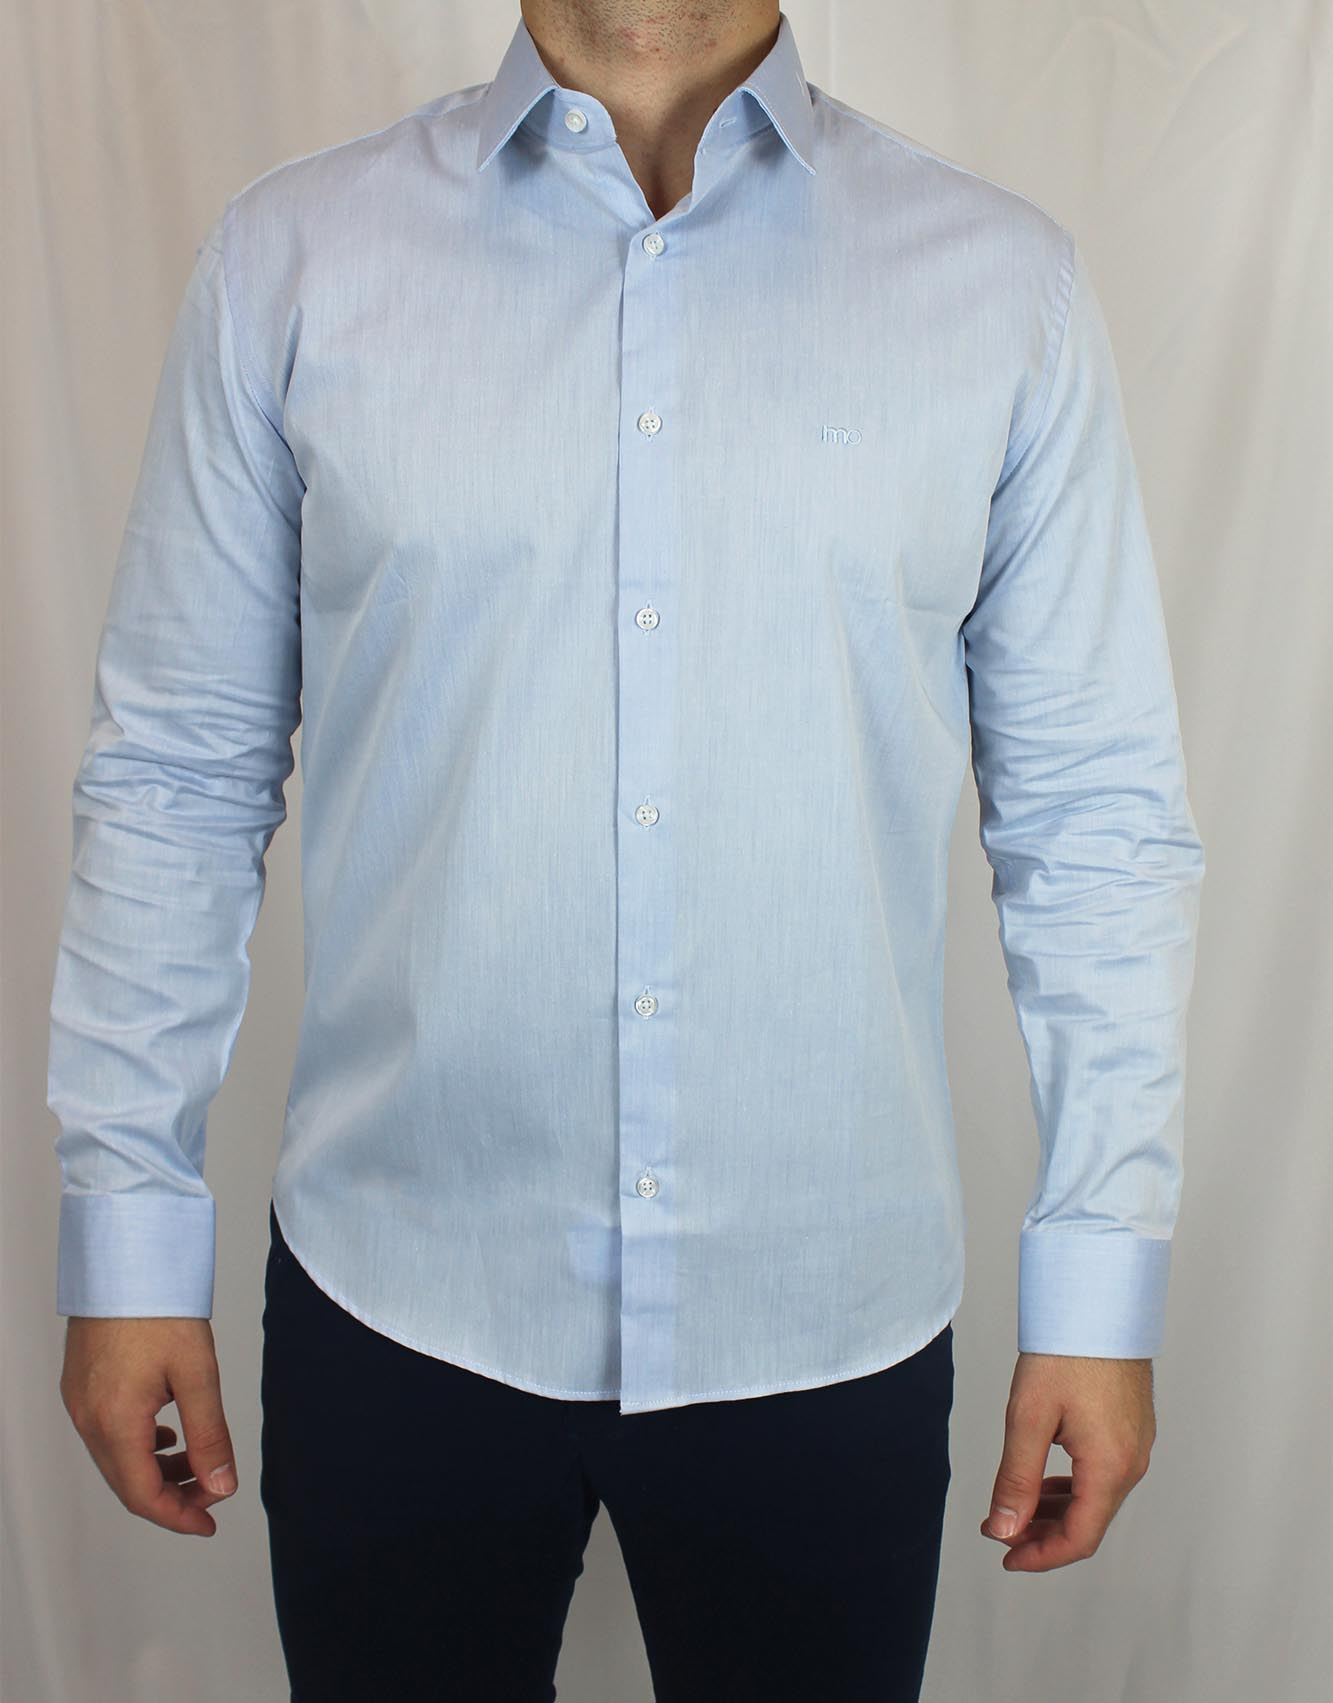 Camisa Social Slim Fit Básica MO Masculina - Azul Claro